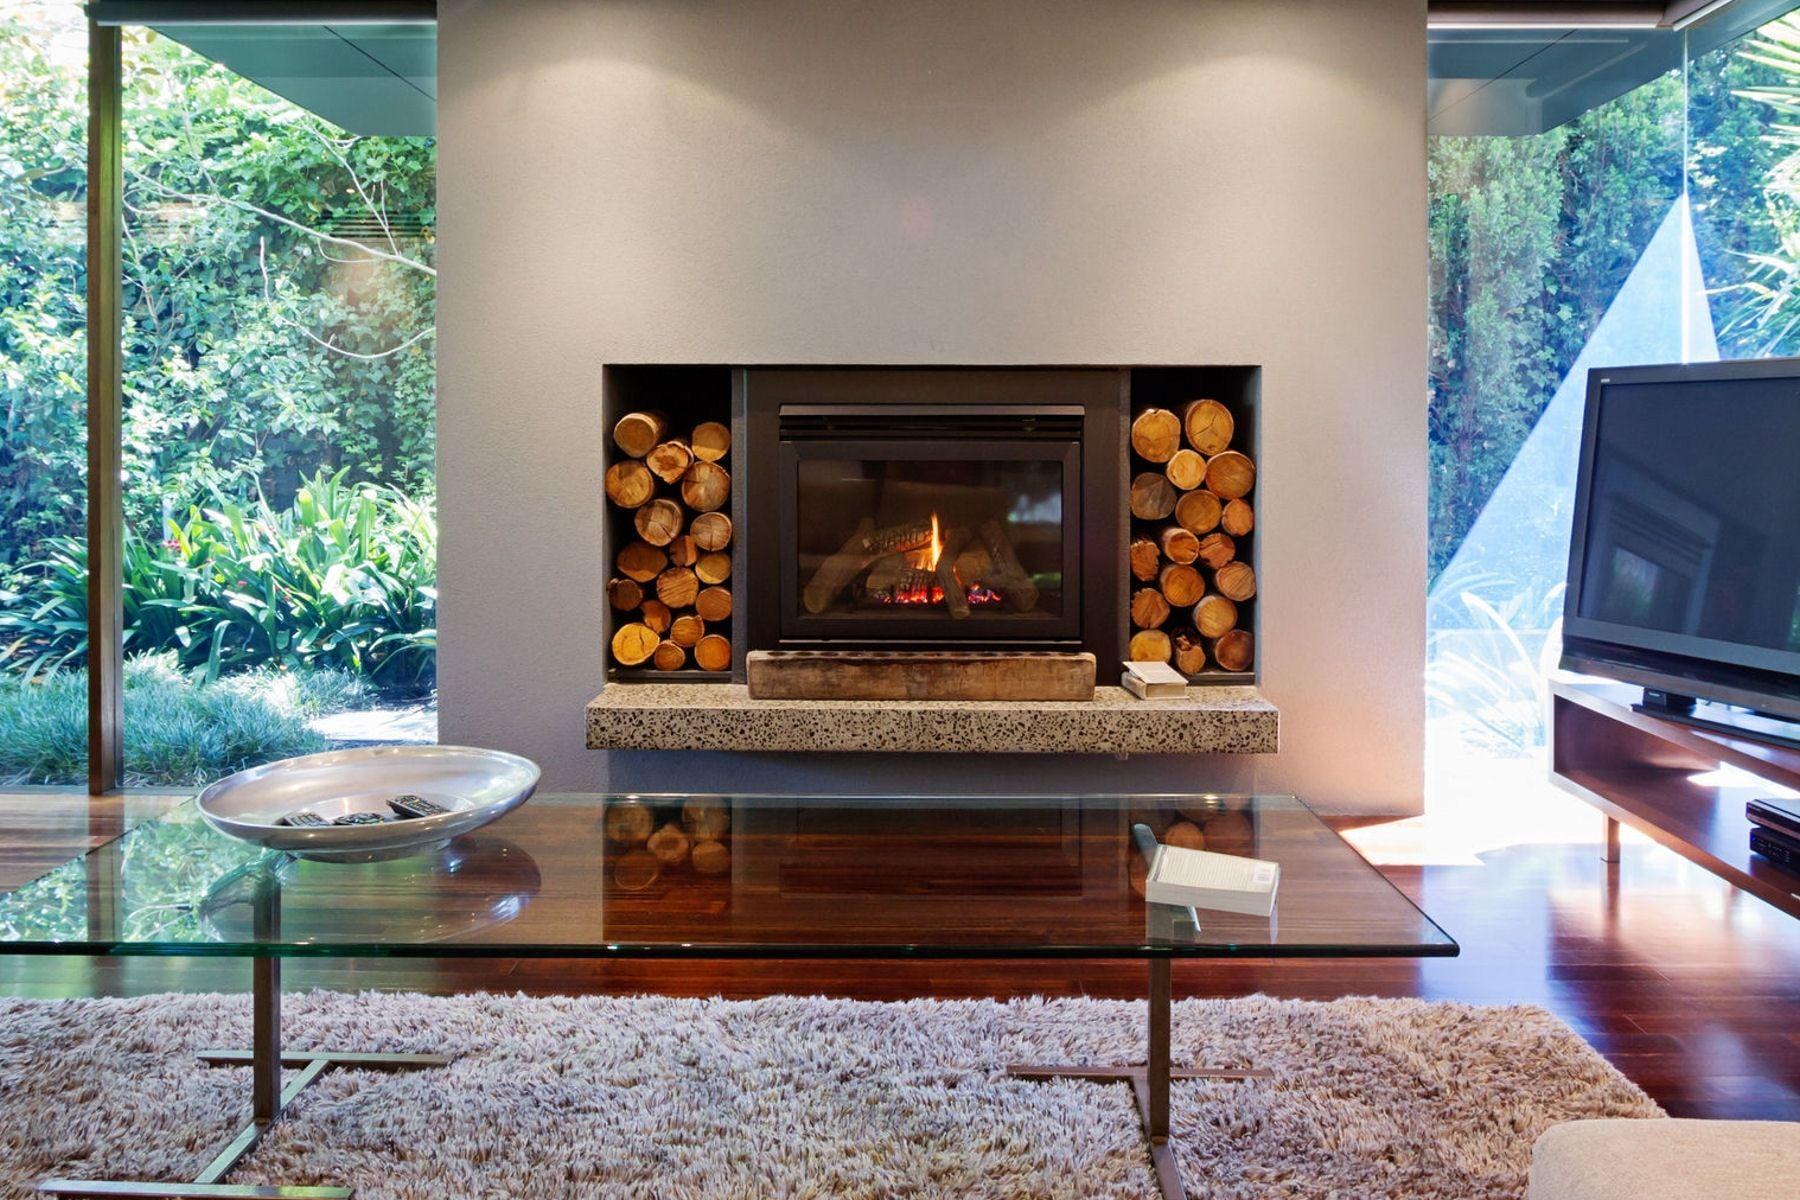 relooker sa chemine crer des rangements pour le bois with chemine relooke. Black Bedroom Furniture Sets. Home Design Ideas